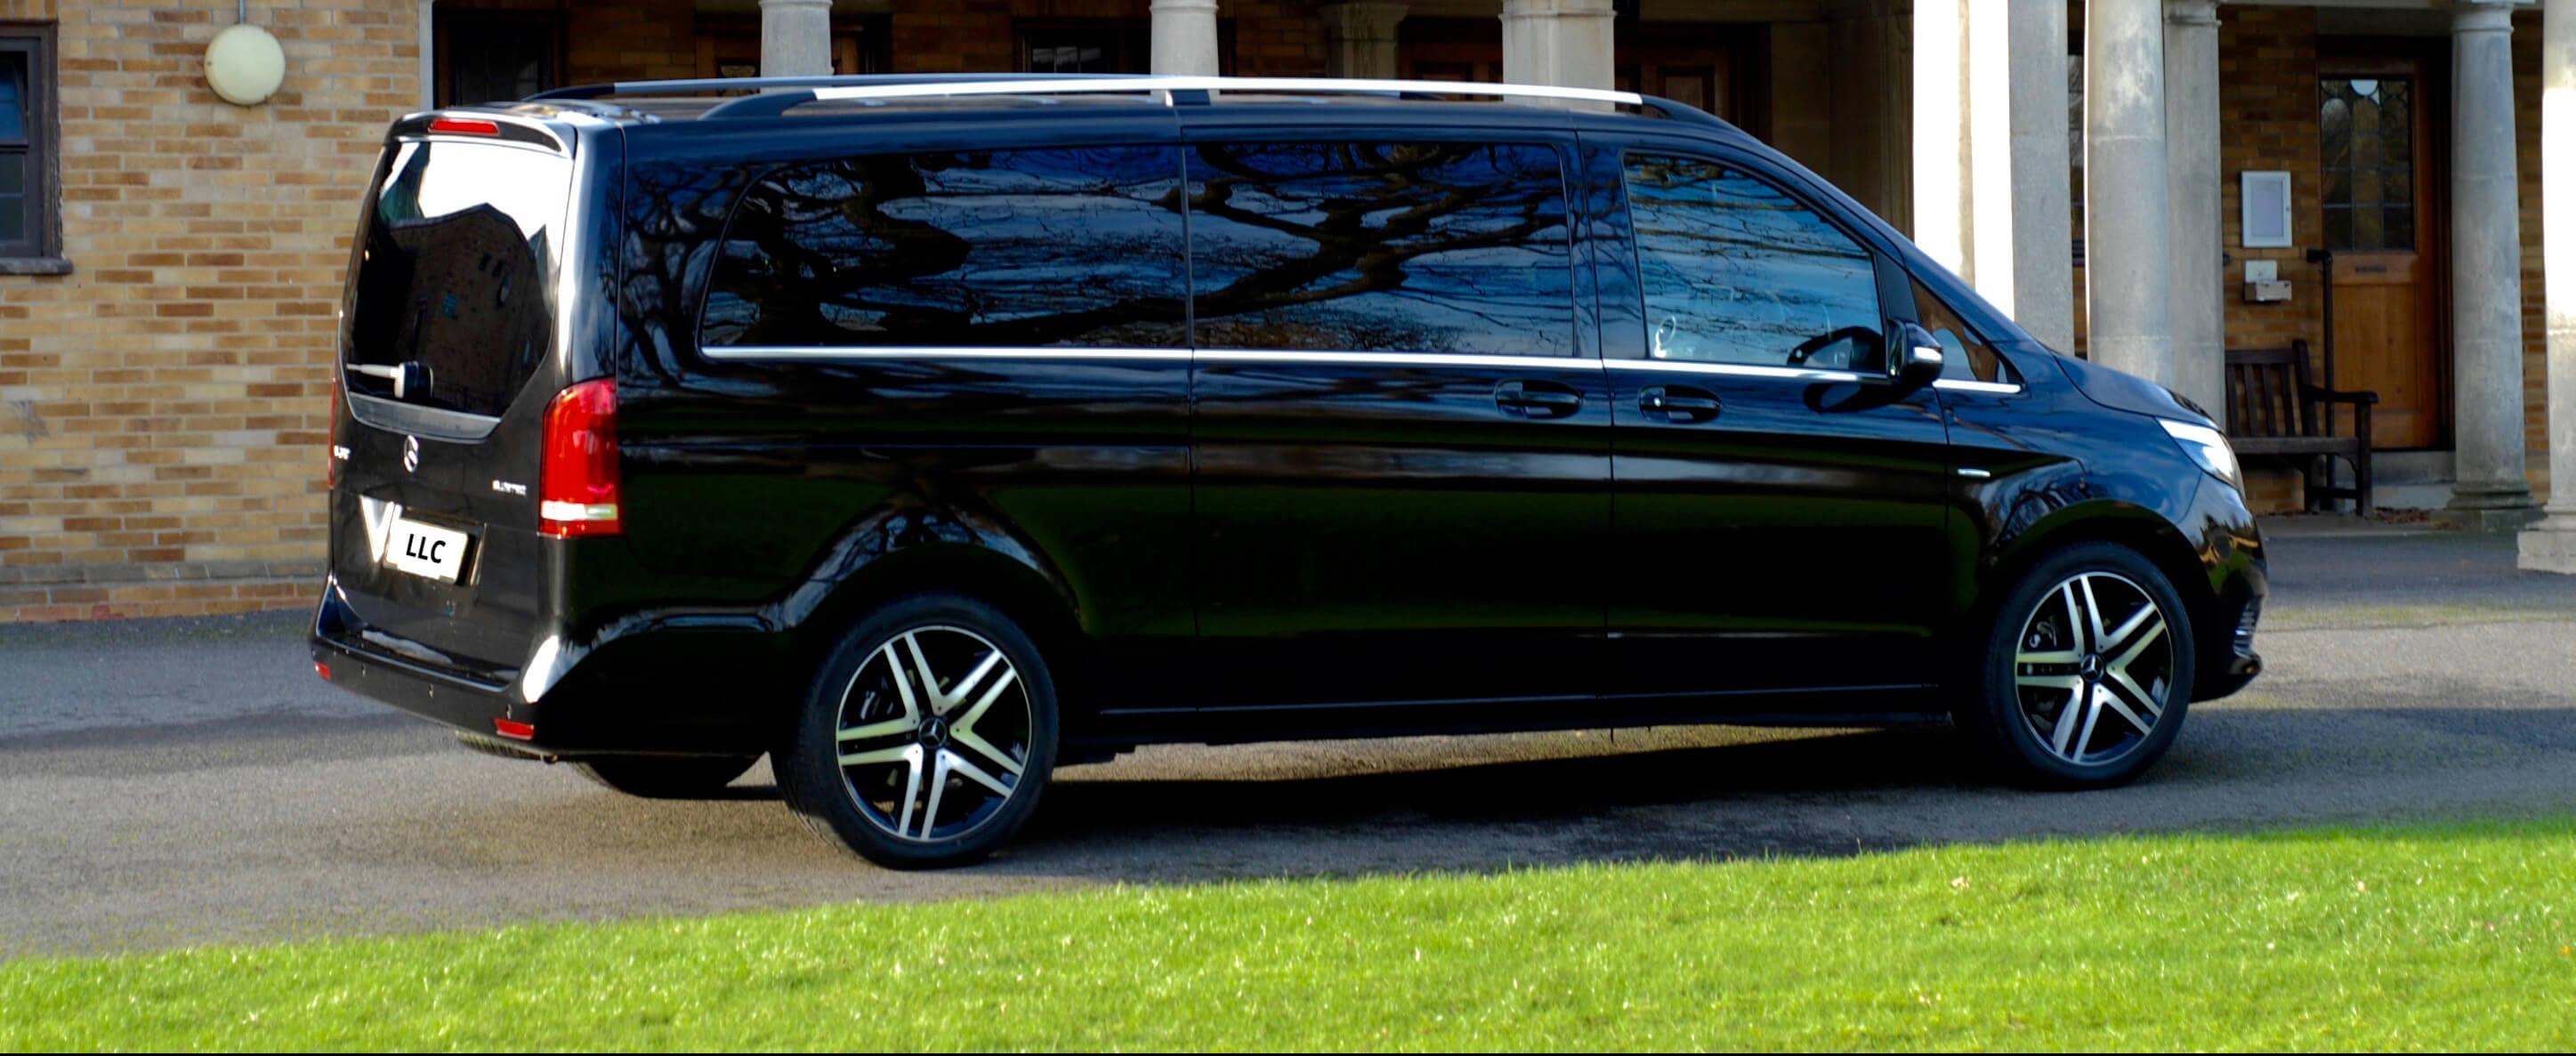 Mercedes V Class Exterior